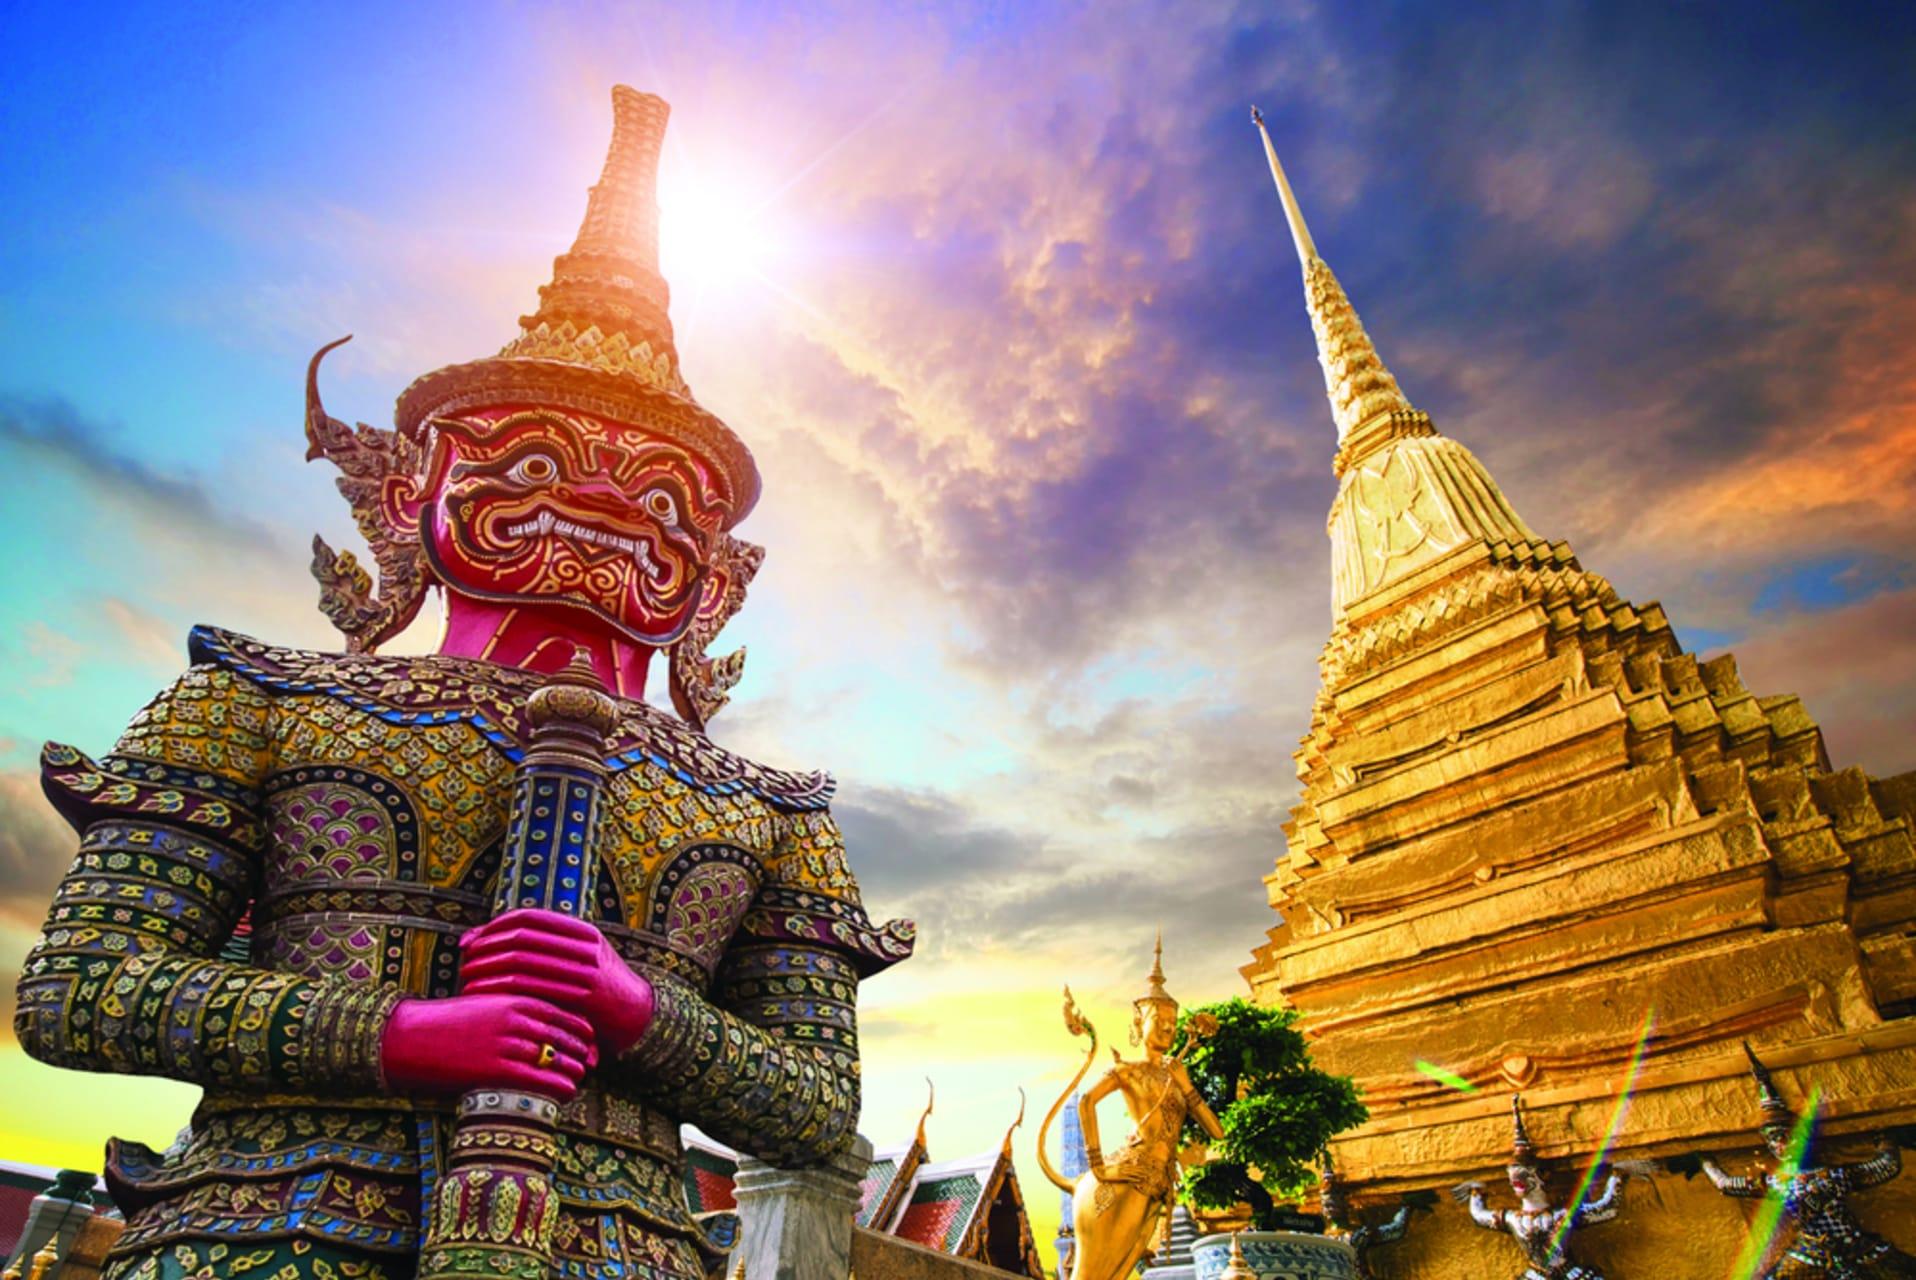 Bangkok - Grand Palace & Royal Temple of the Emerald Buddha